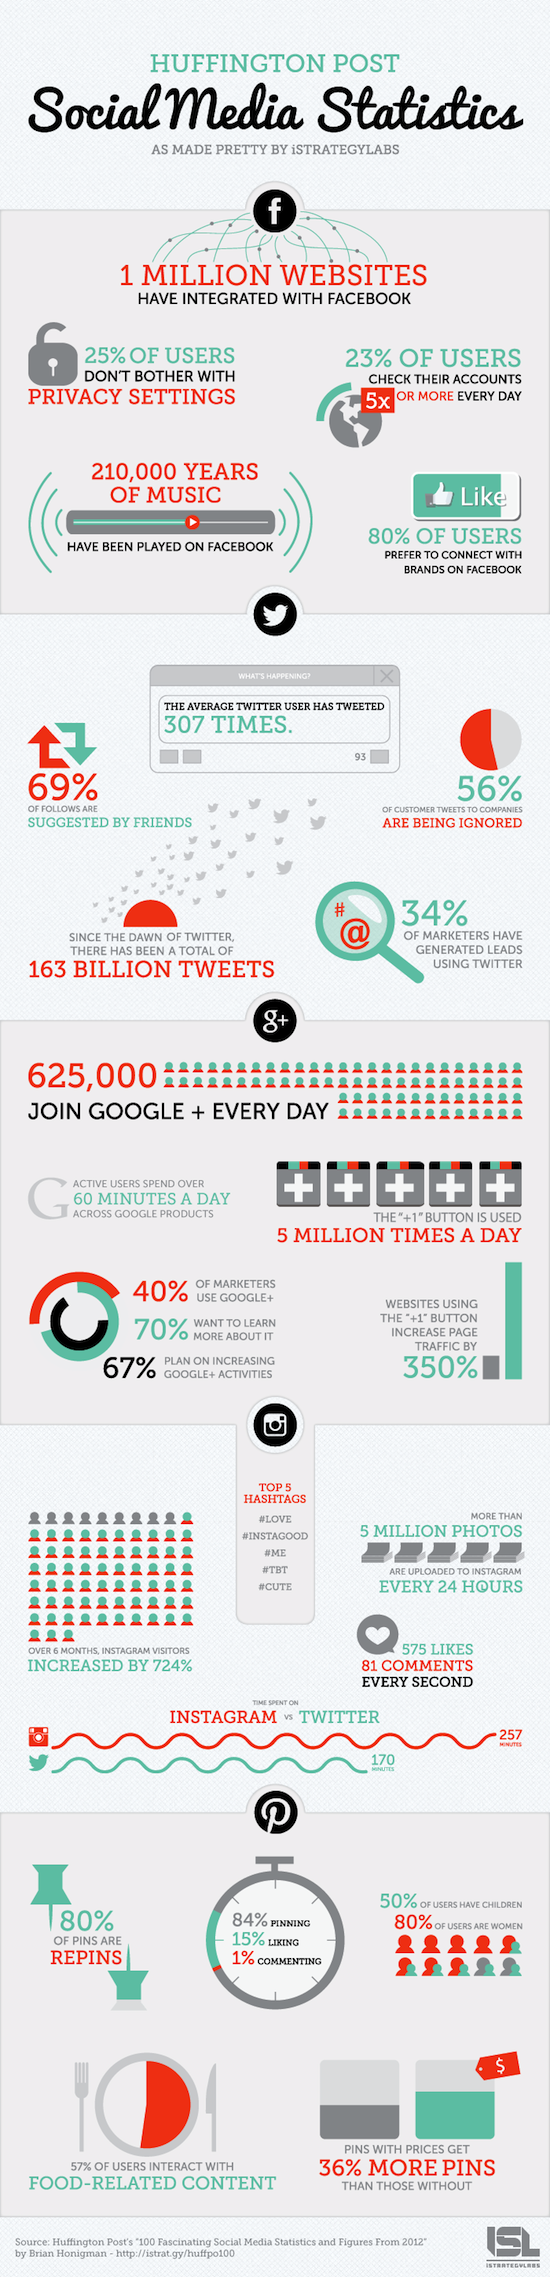 infographie social media statistics 2012